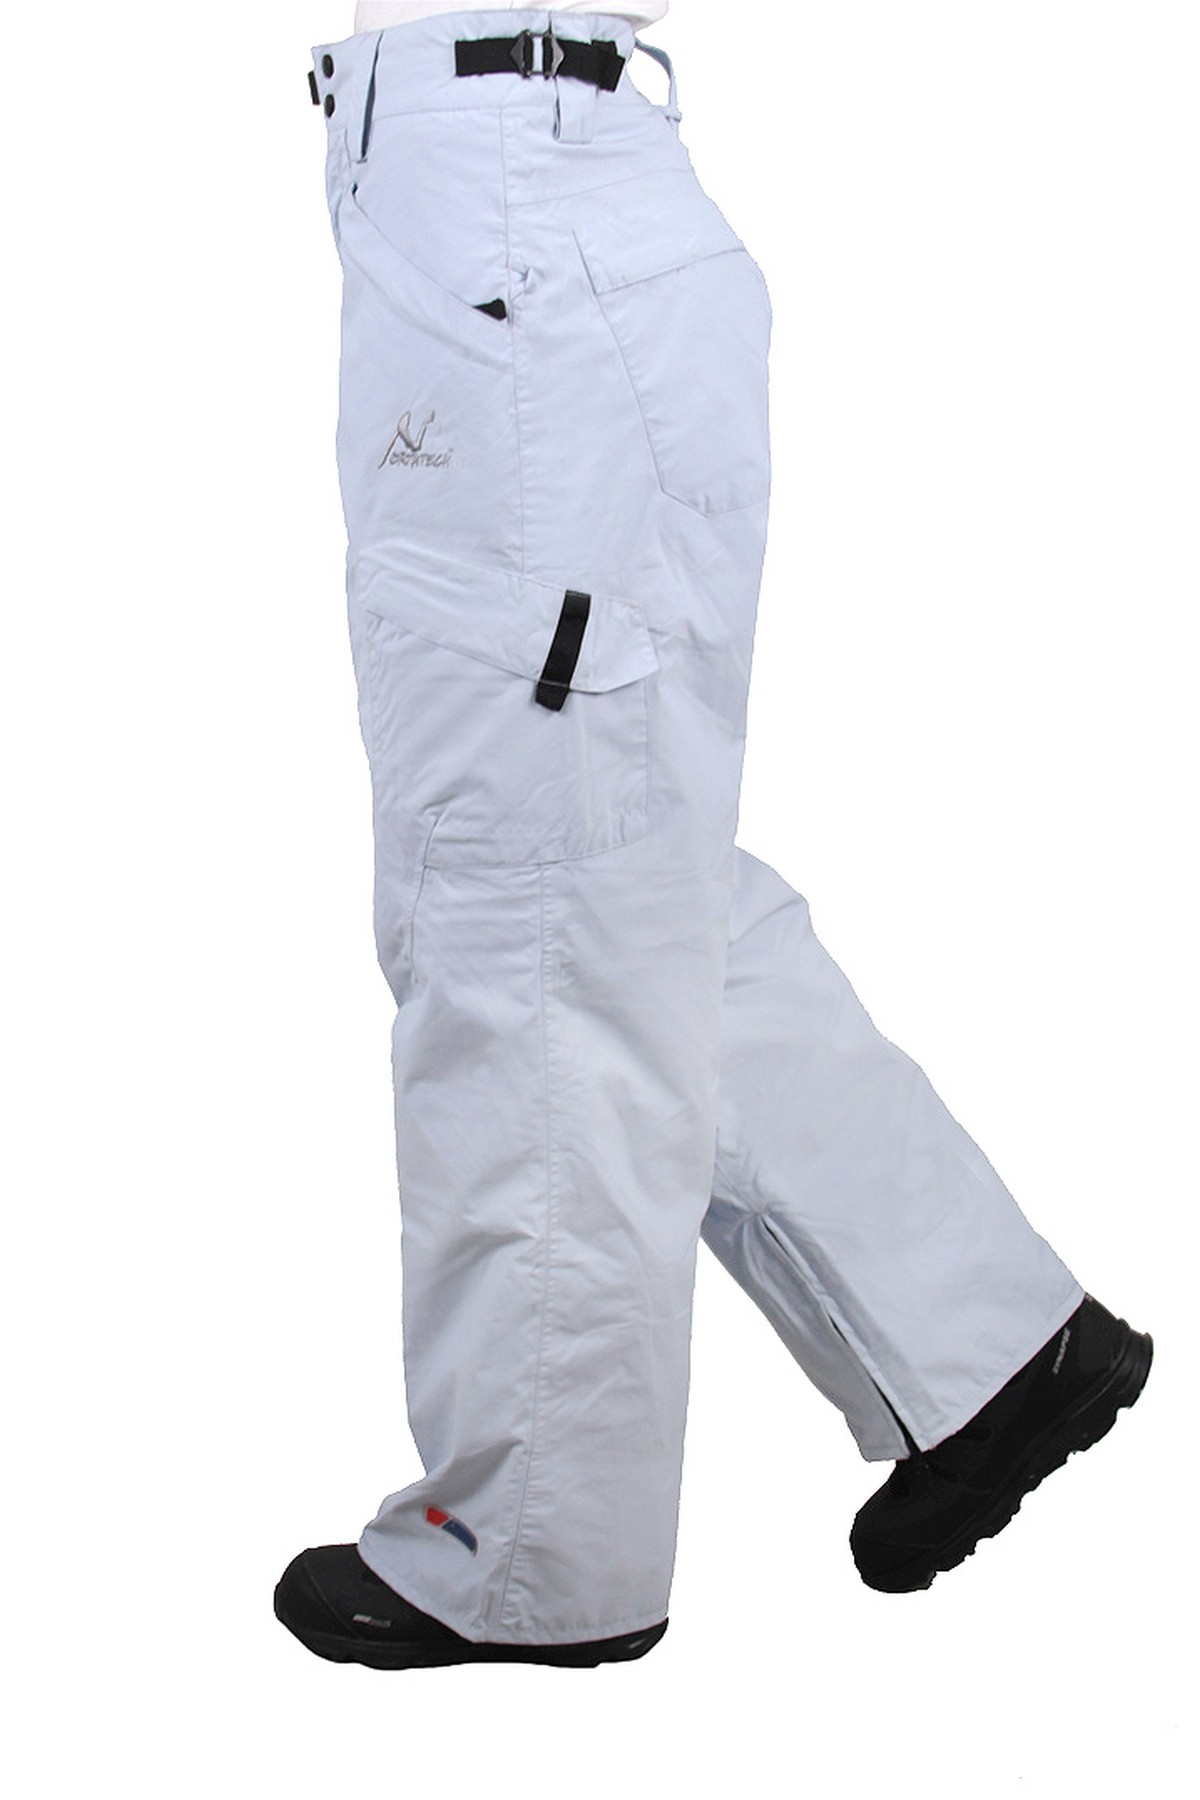 NorthTech Kadın Kayak Pantolon Beyaz (PTW-6610)